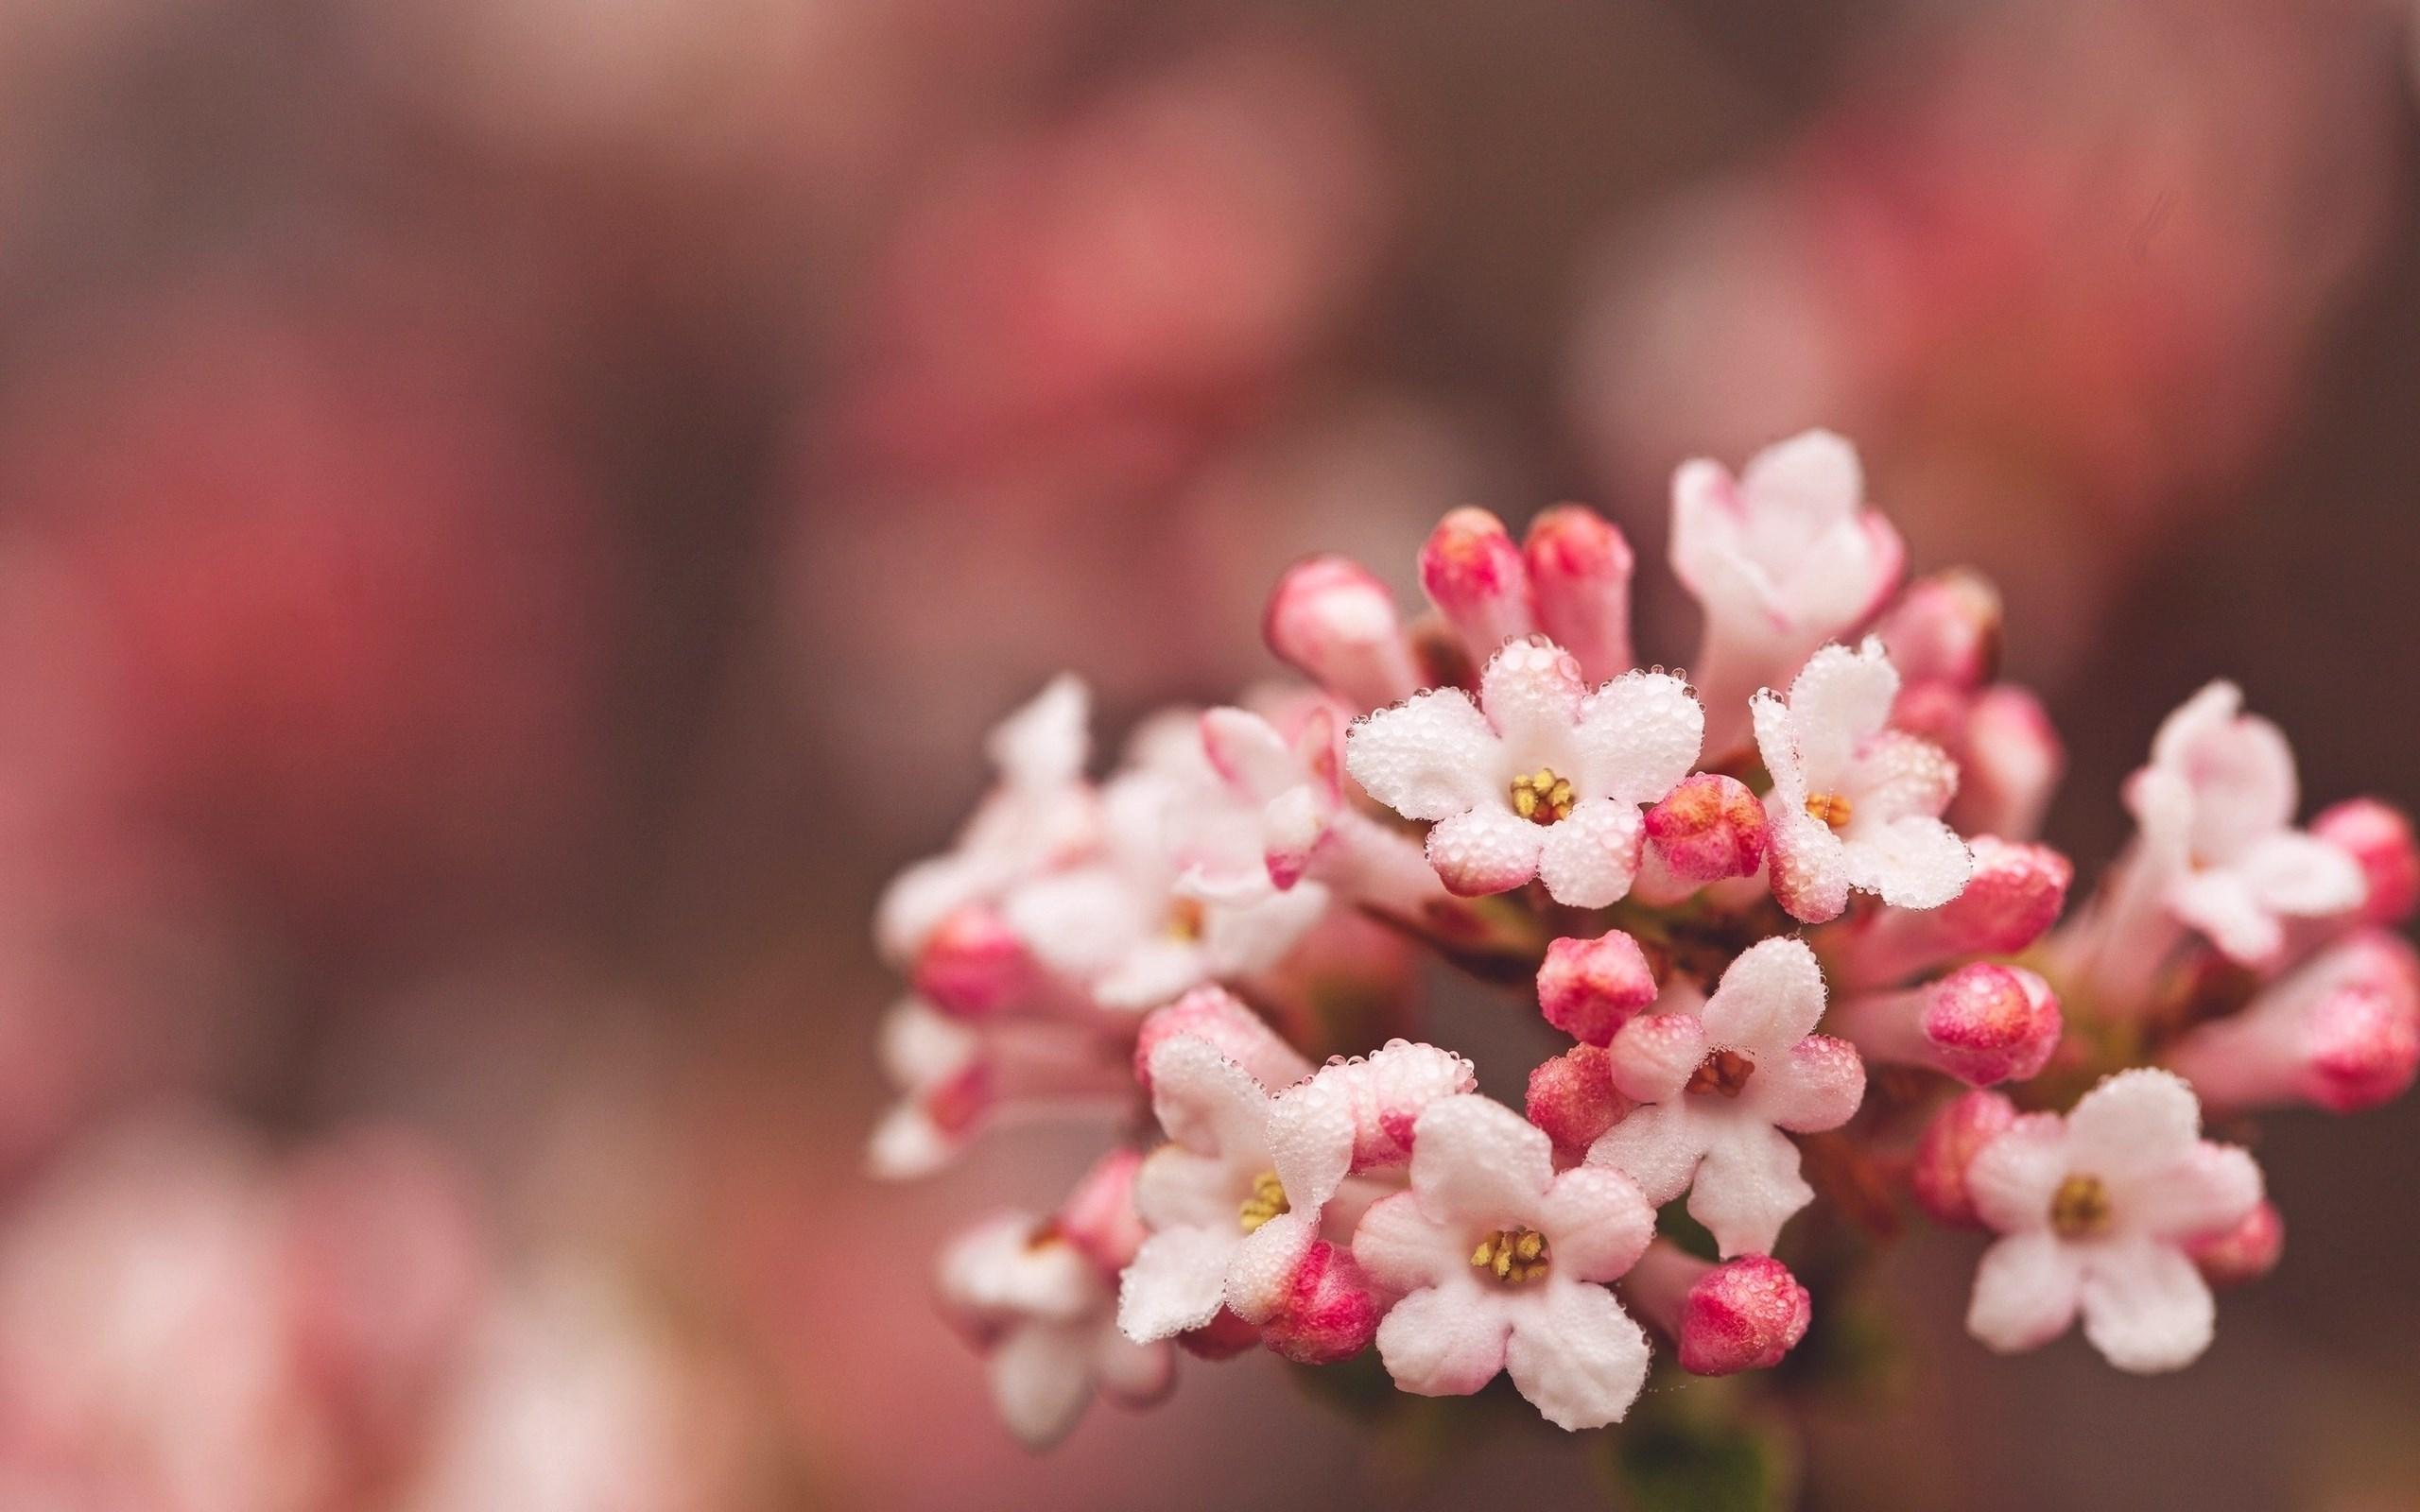 Hd Pink Flowers - HD Desktop Wallpapers